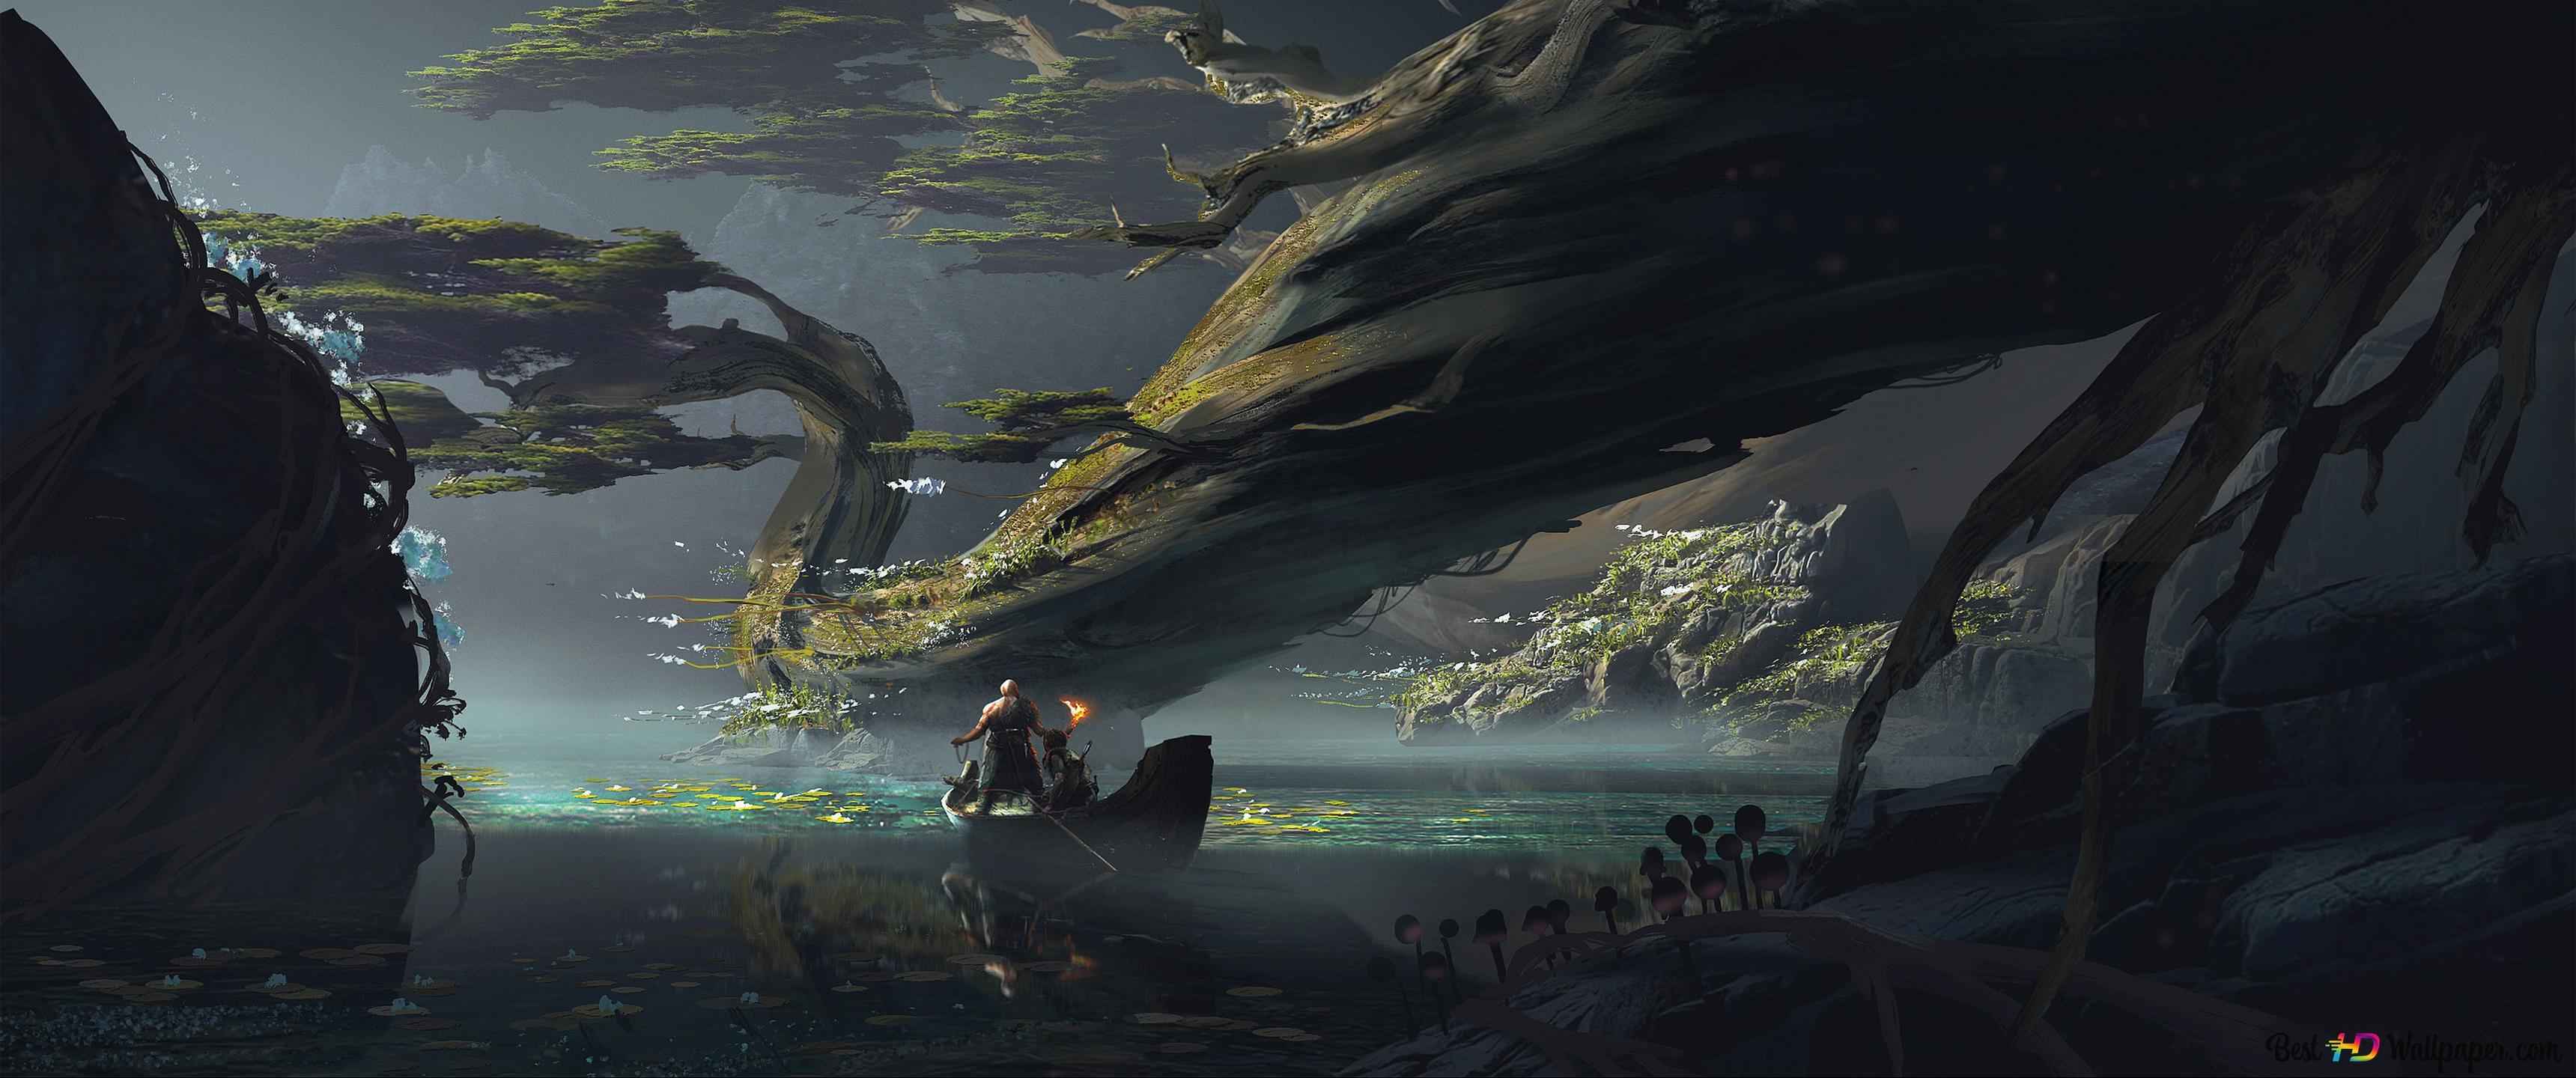 God Of War 4 Video Game Fantasy Art Hd Wallpaper Download